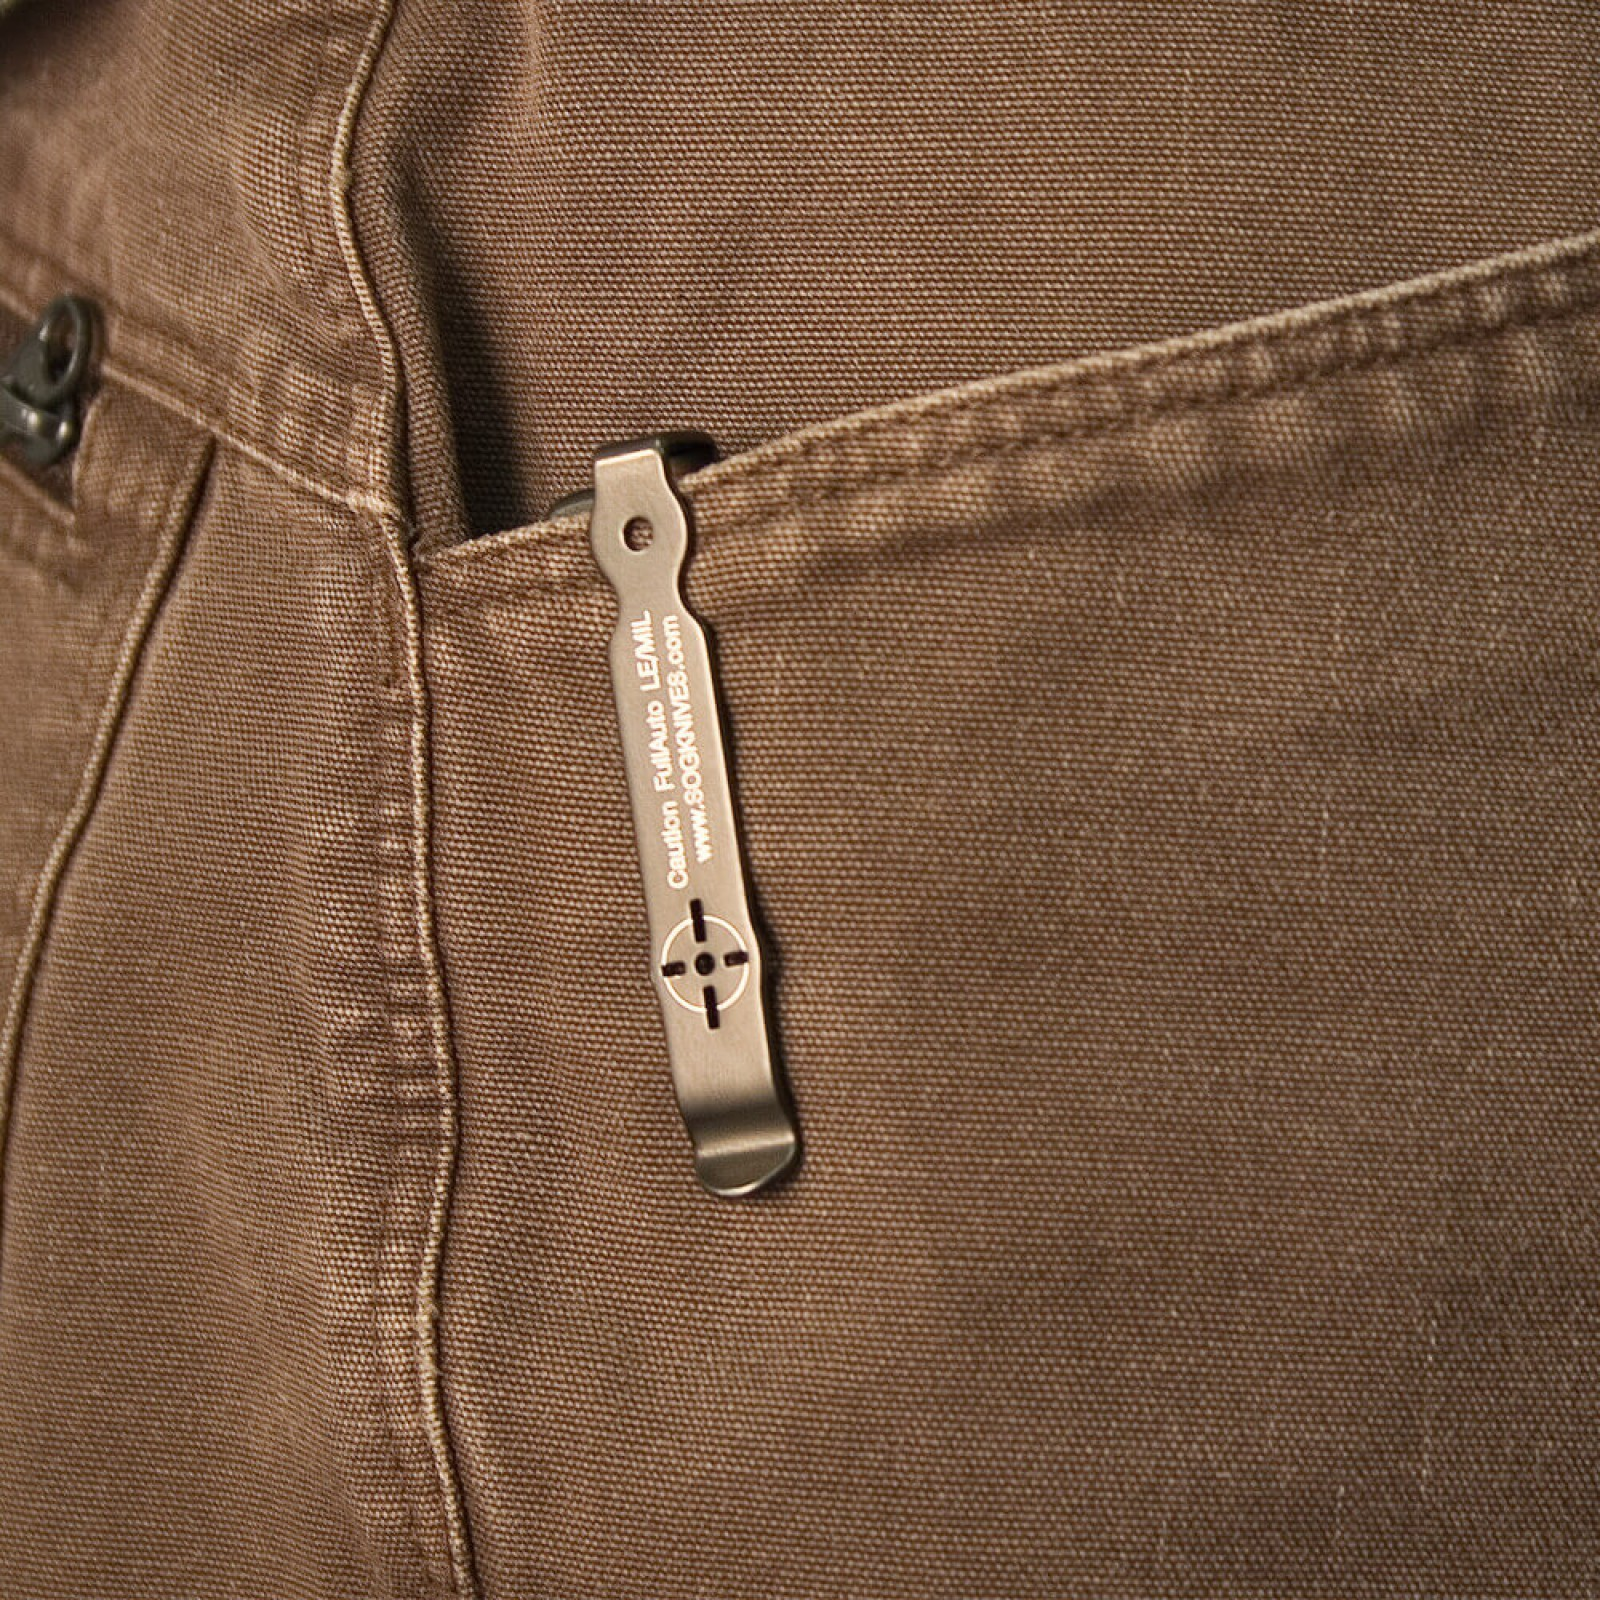 Фото 5 - Складной автоматический нож SOG-TAC Mini ST11, сталь Aus 8, рукоять алюминий